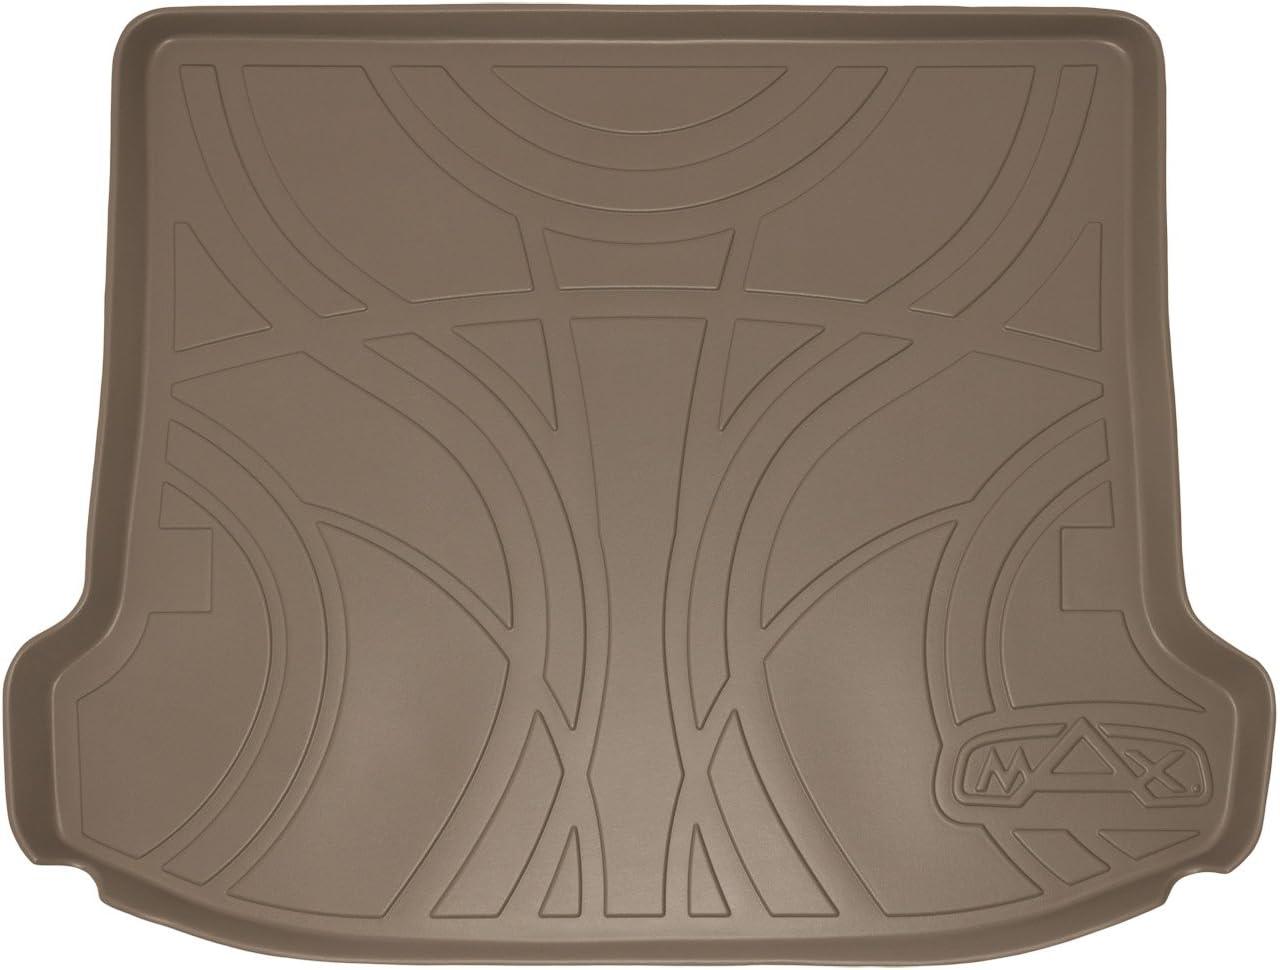 MAXLINER All Weather Cargo Liner Floor Mat Tan for 2010-2016 Cadillac SRX